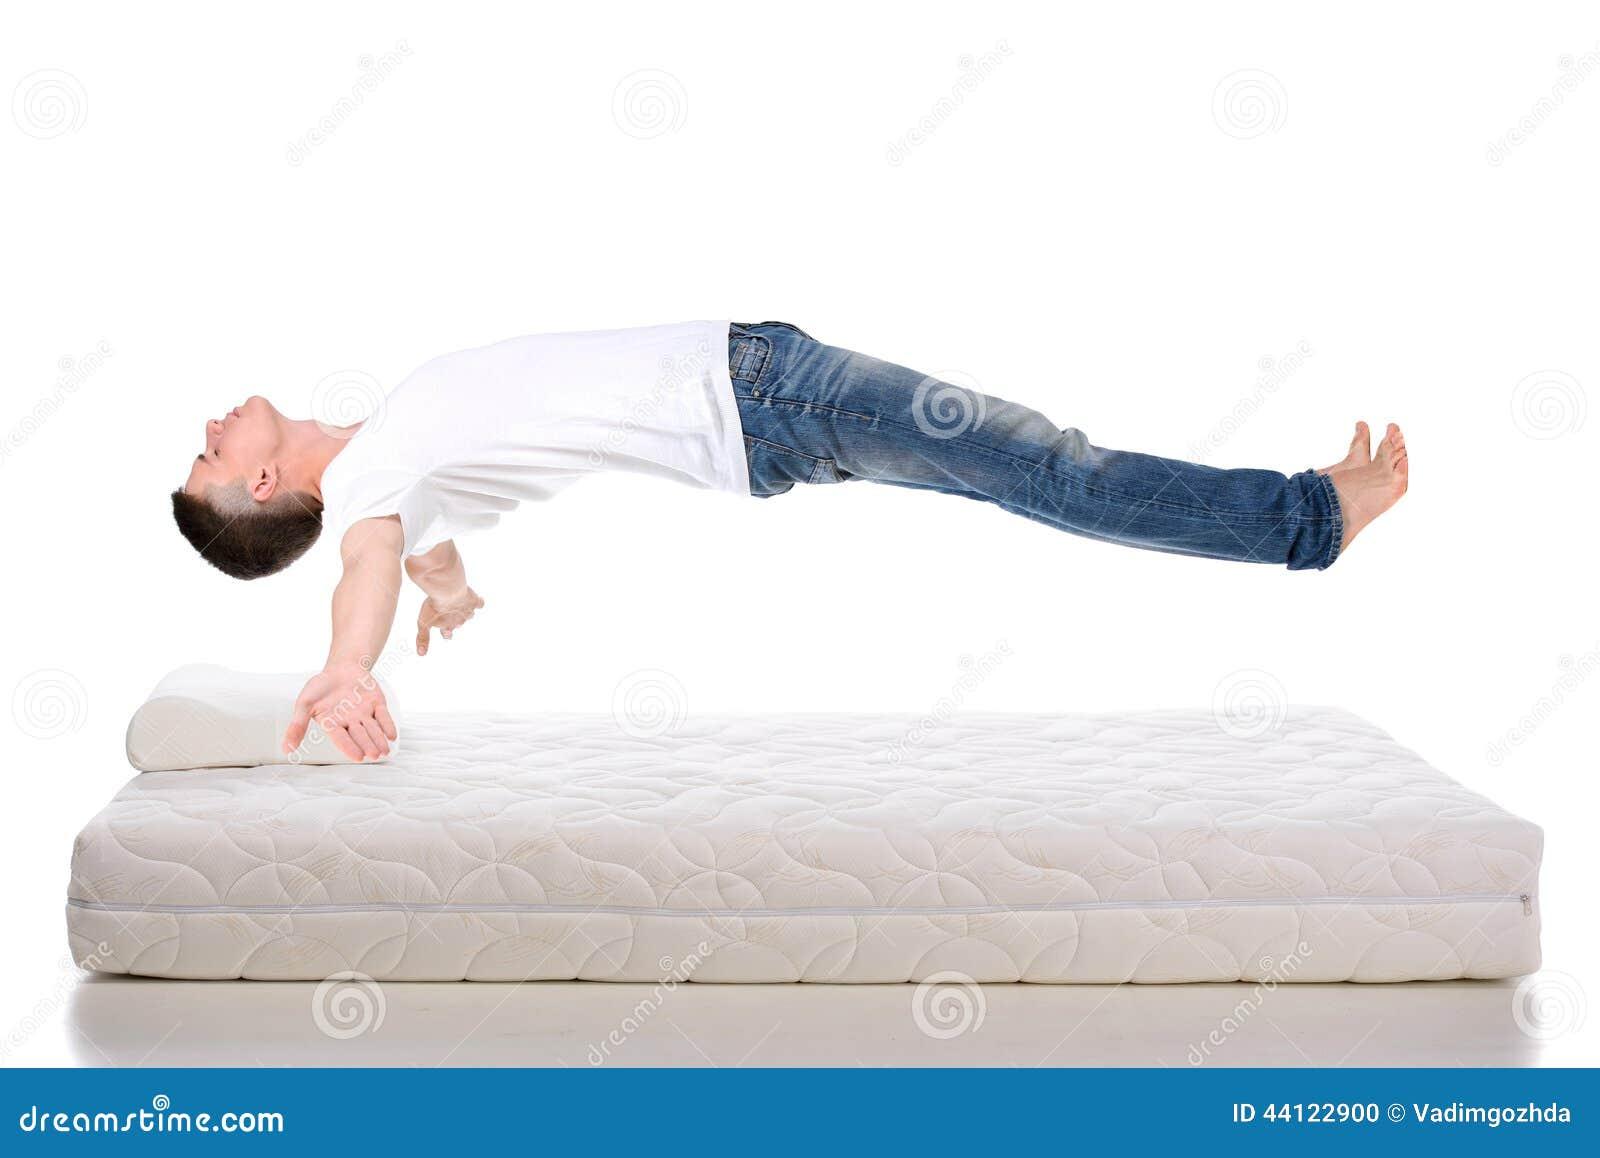 Mattress for Sleeping bed